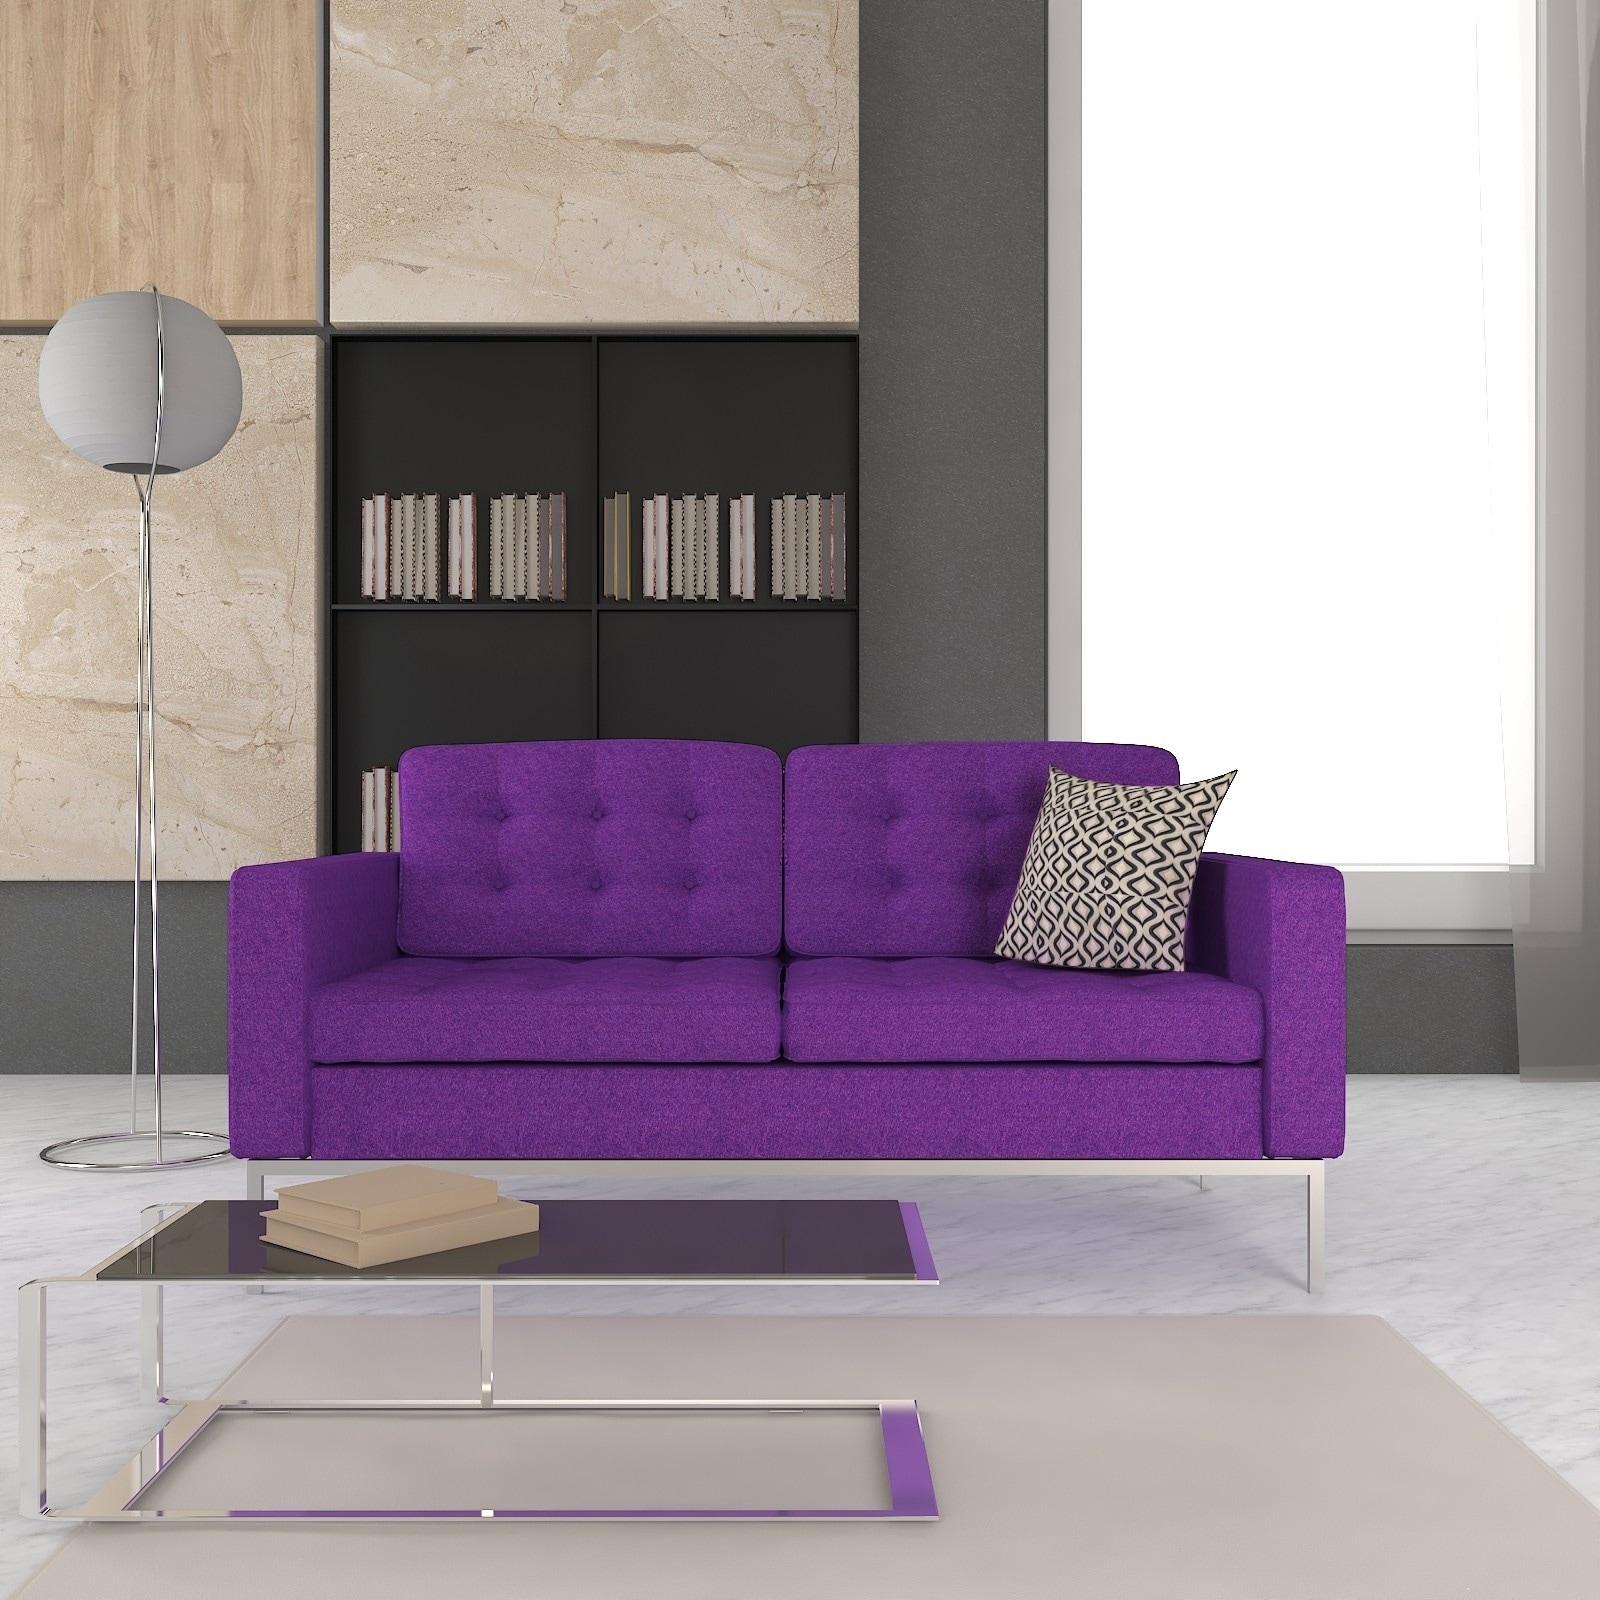 LeisureMod Lorane Modern Purple Wool Fabric Studio Sofa (...